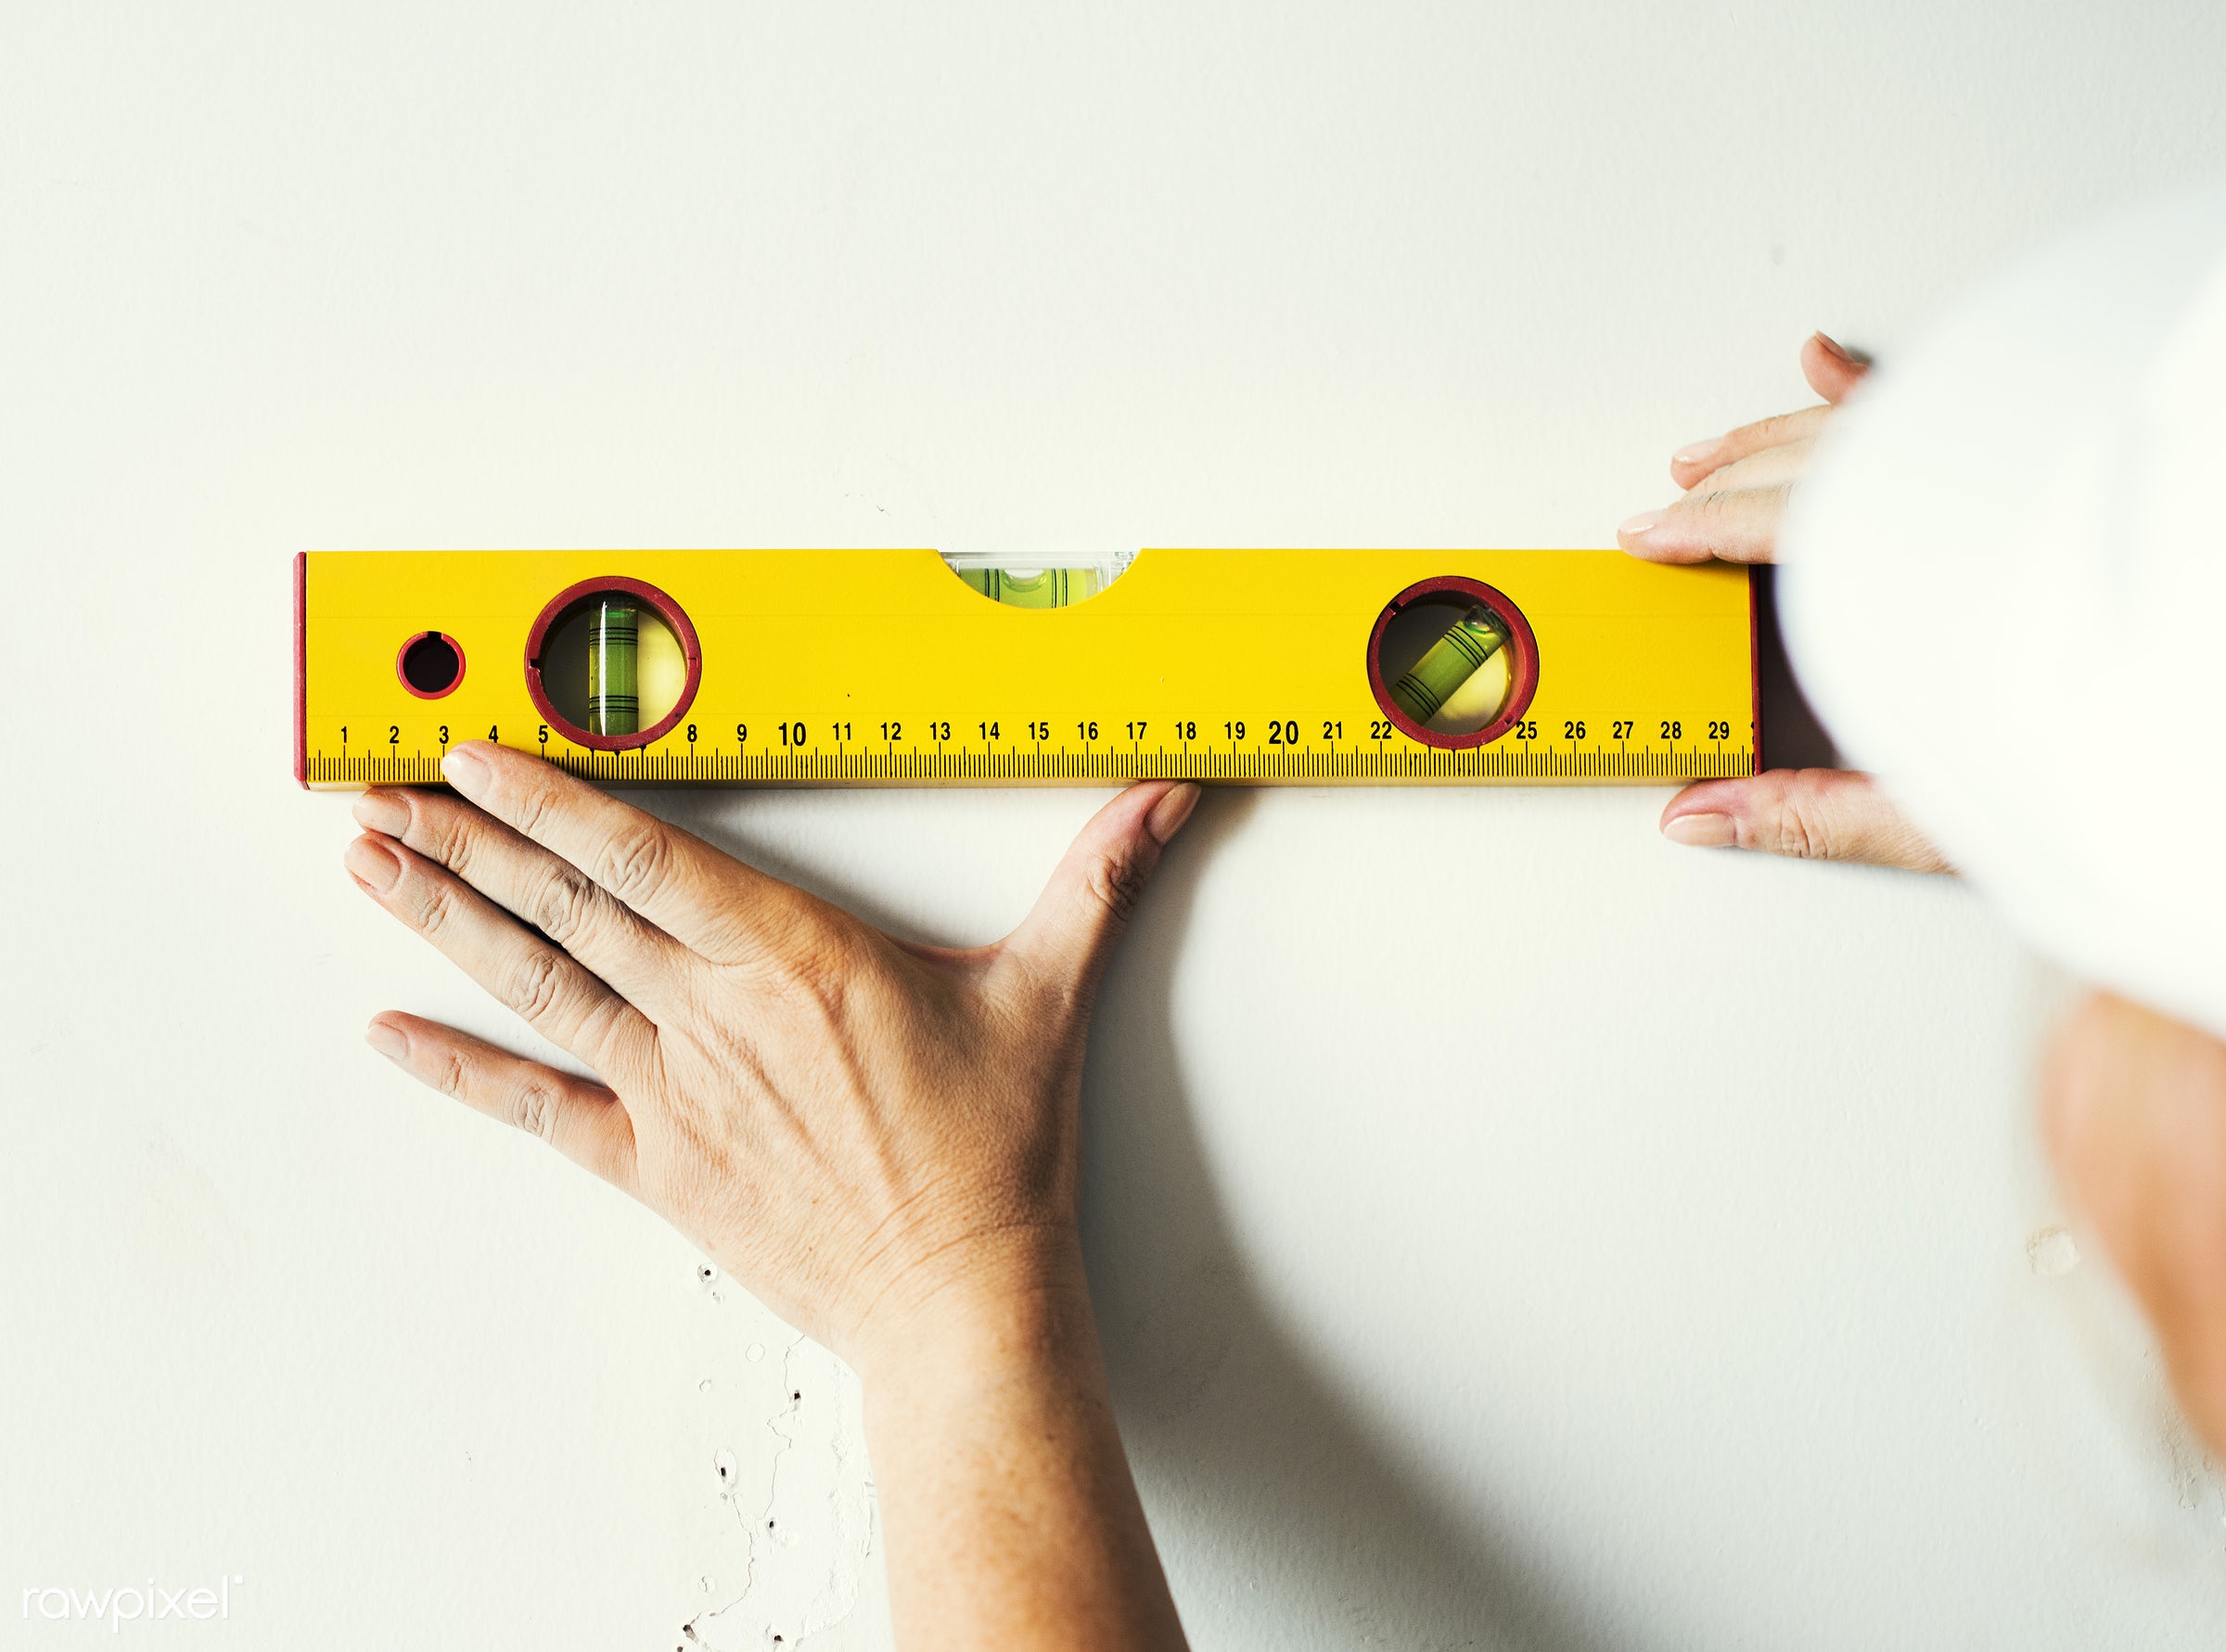 home, technician, development, tool, equipment, house, engineering, measuring, installation, meter, repairman, carpenter,...